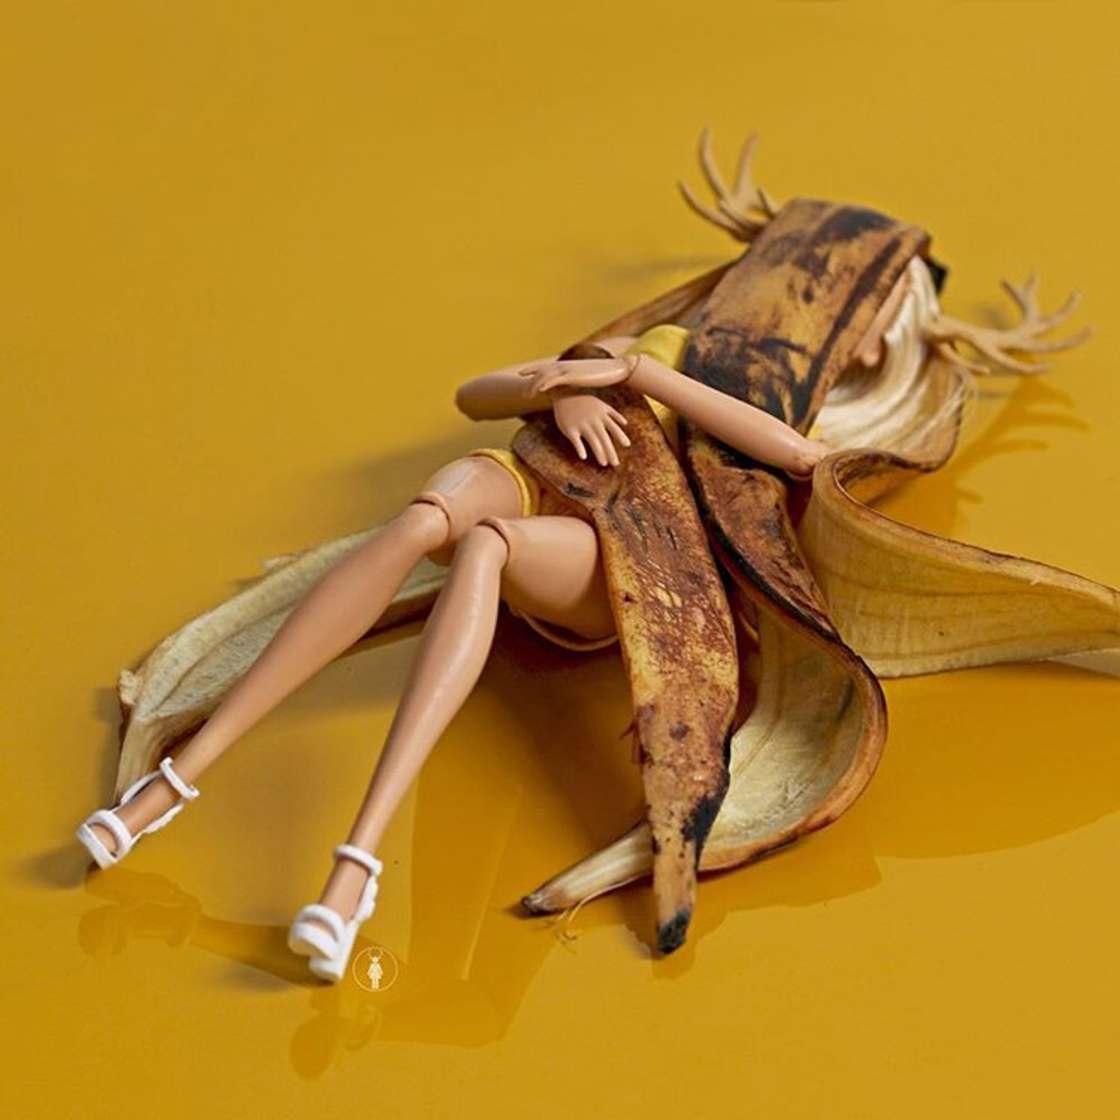 Trophy Wife Barbie - La vie debridee d'une Barbie sur Instagram